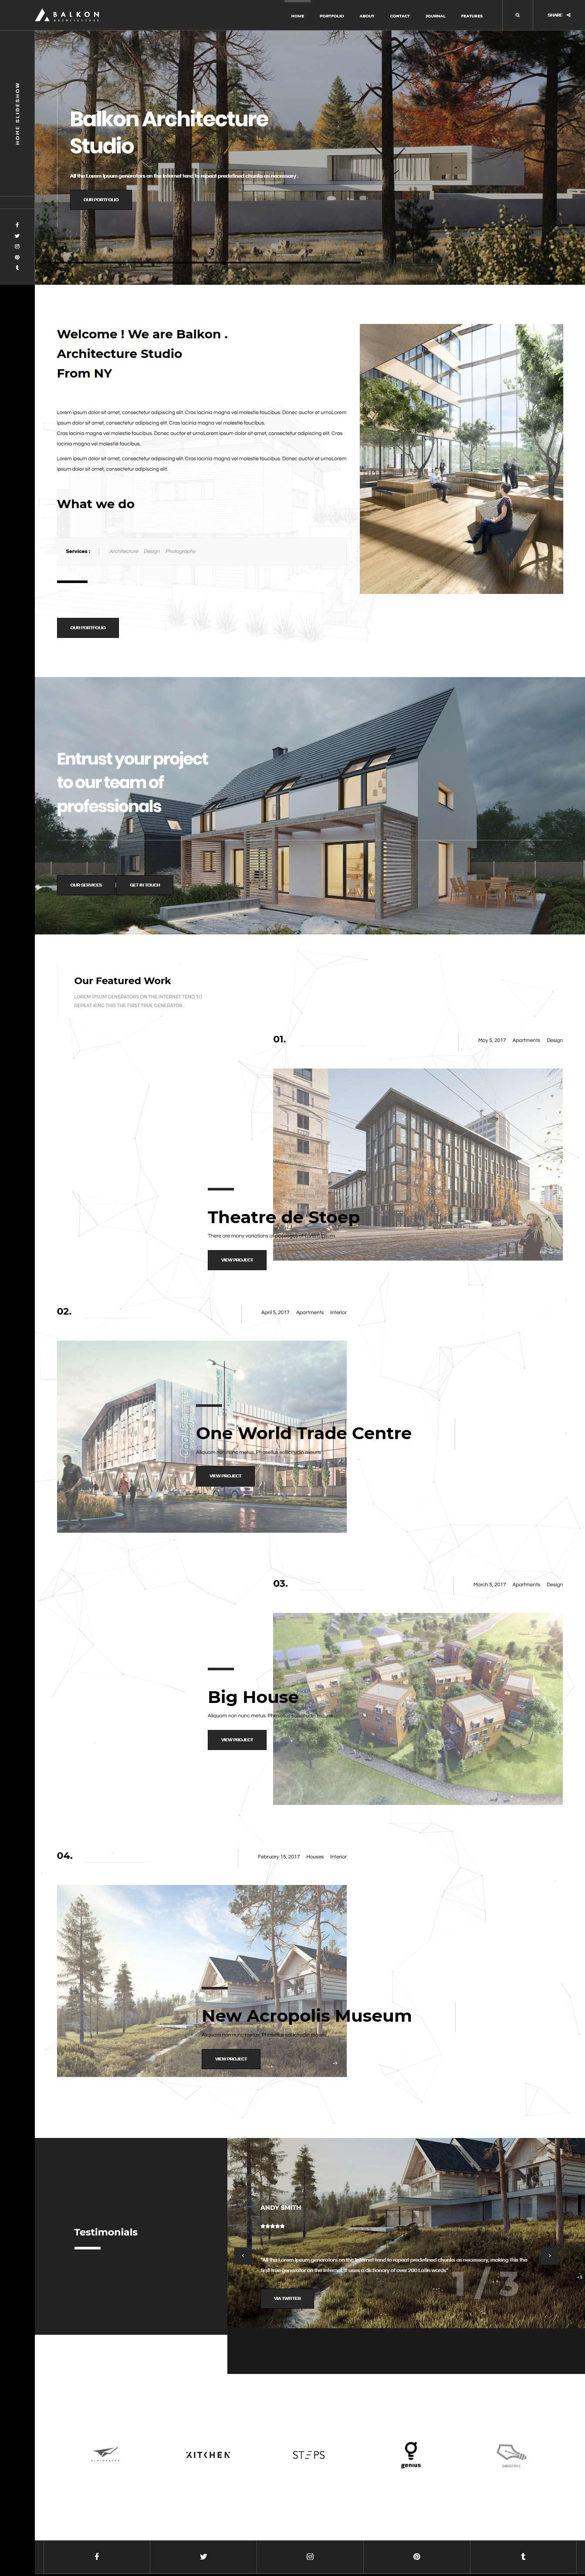 balkon best premium architecture wordpress theme - 10+ Best Premium Architecture WordPress Themes